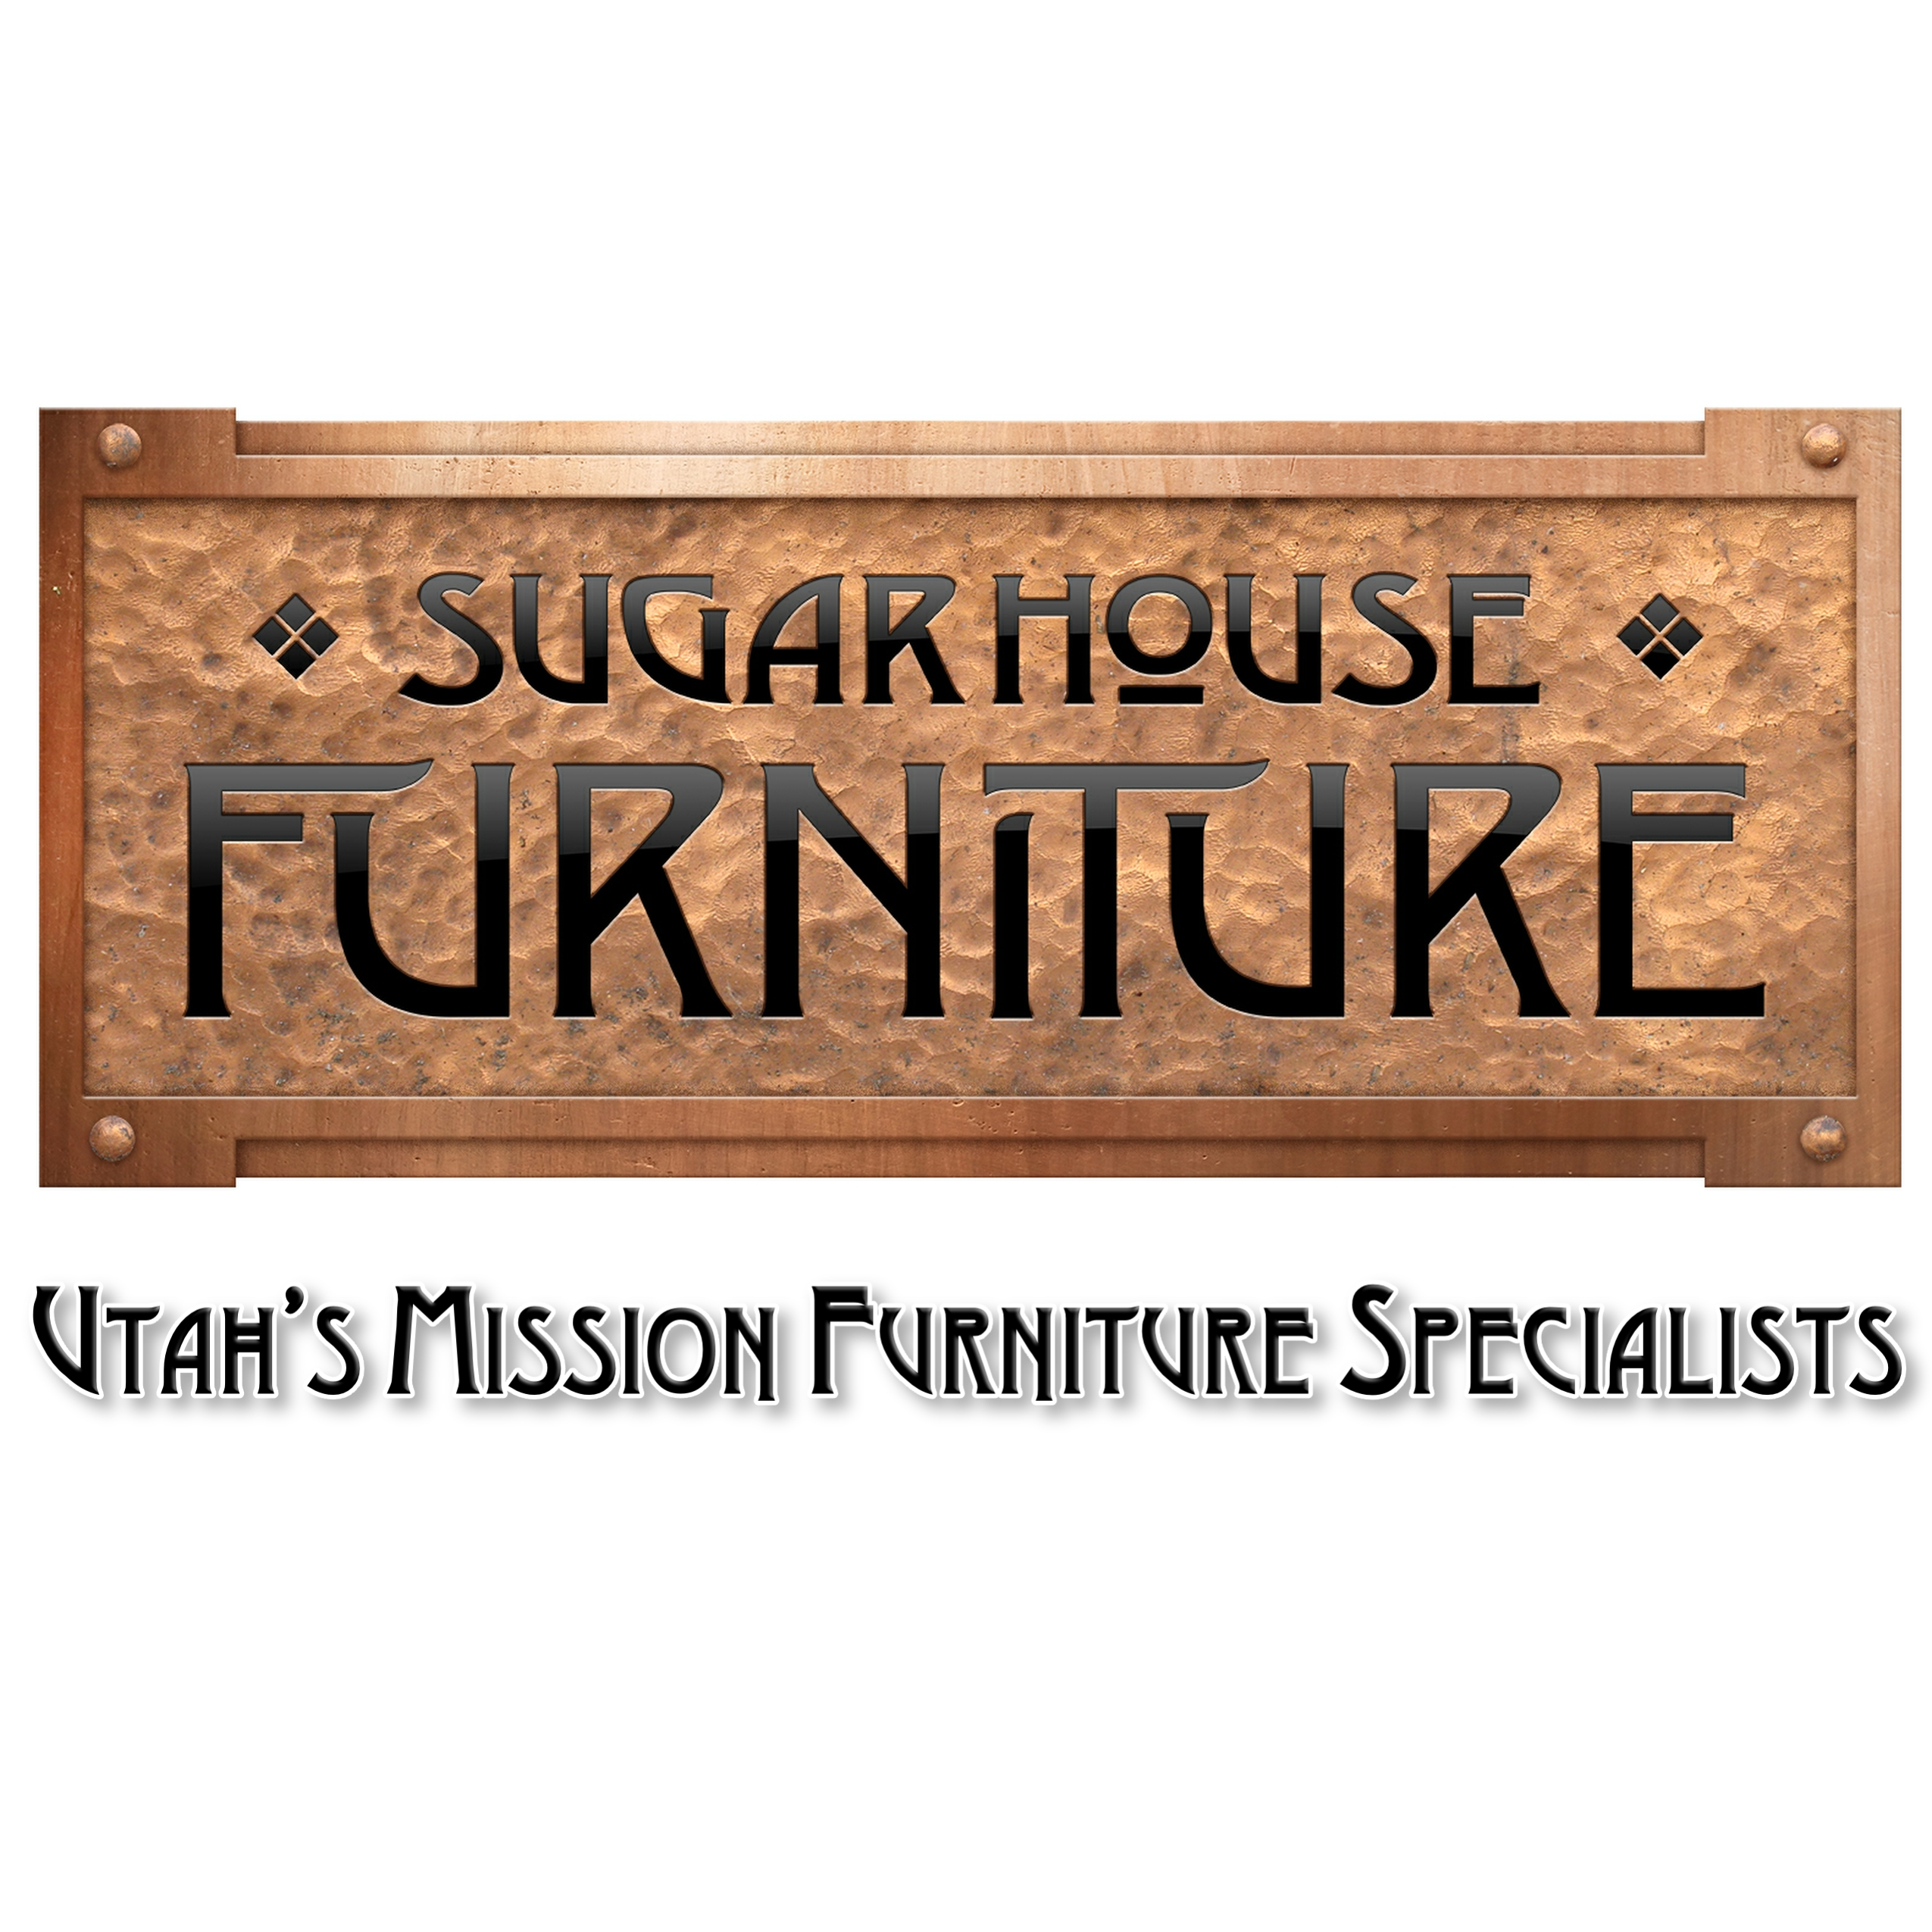 Sugarhouse Furniture 2892 S Highland Dr, Salt Lake City, UT 84106   YP.com